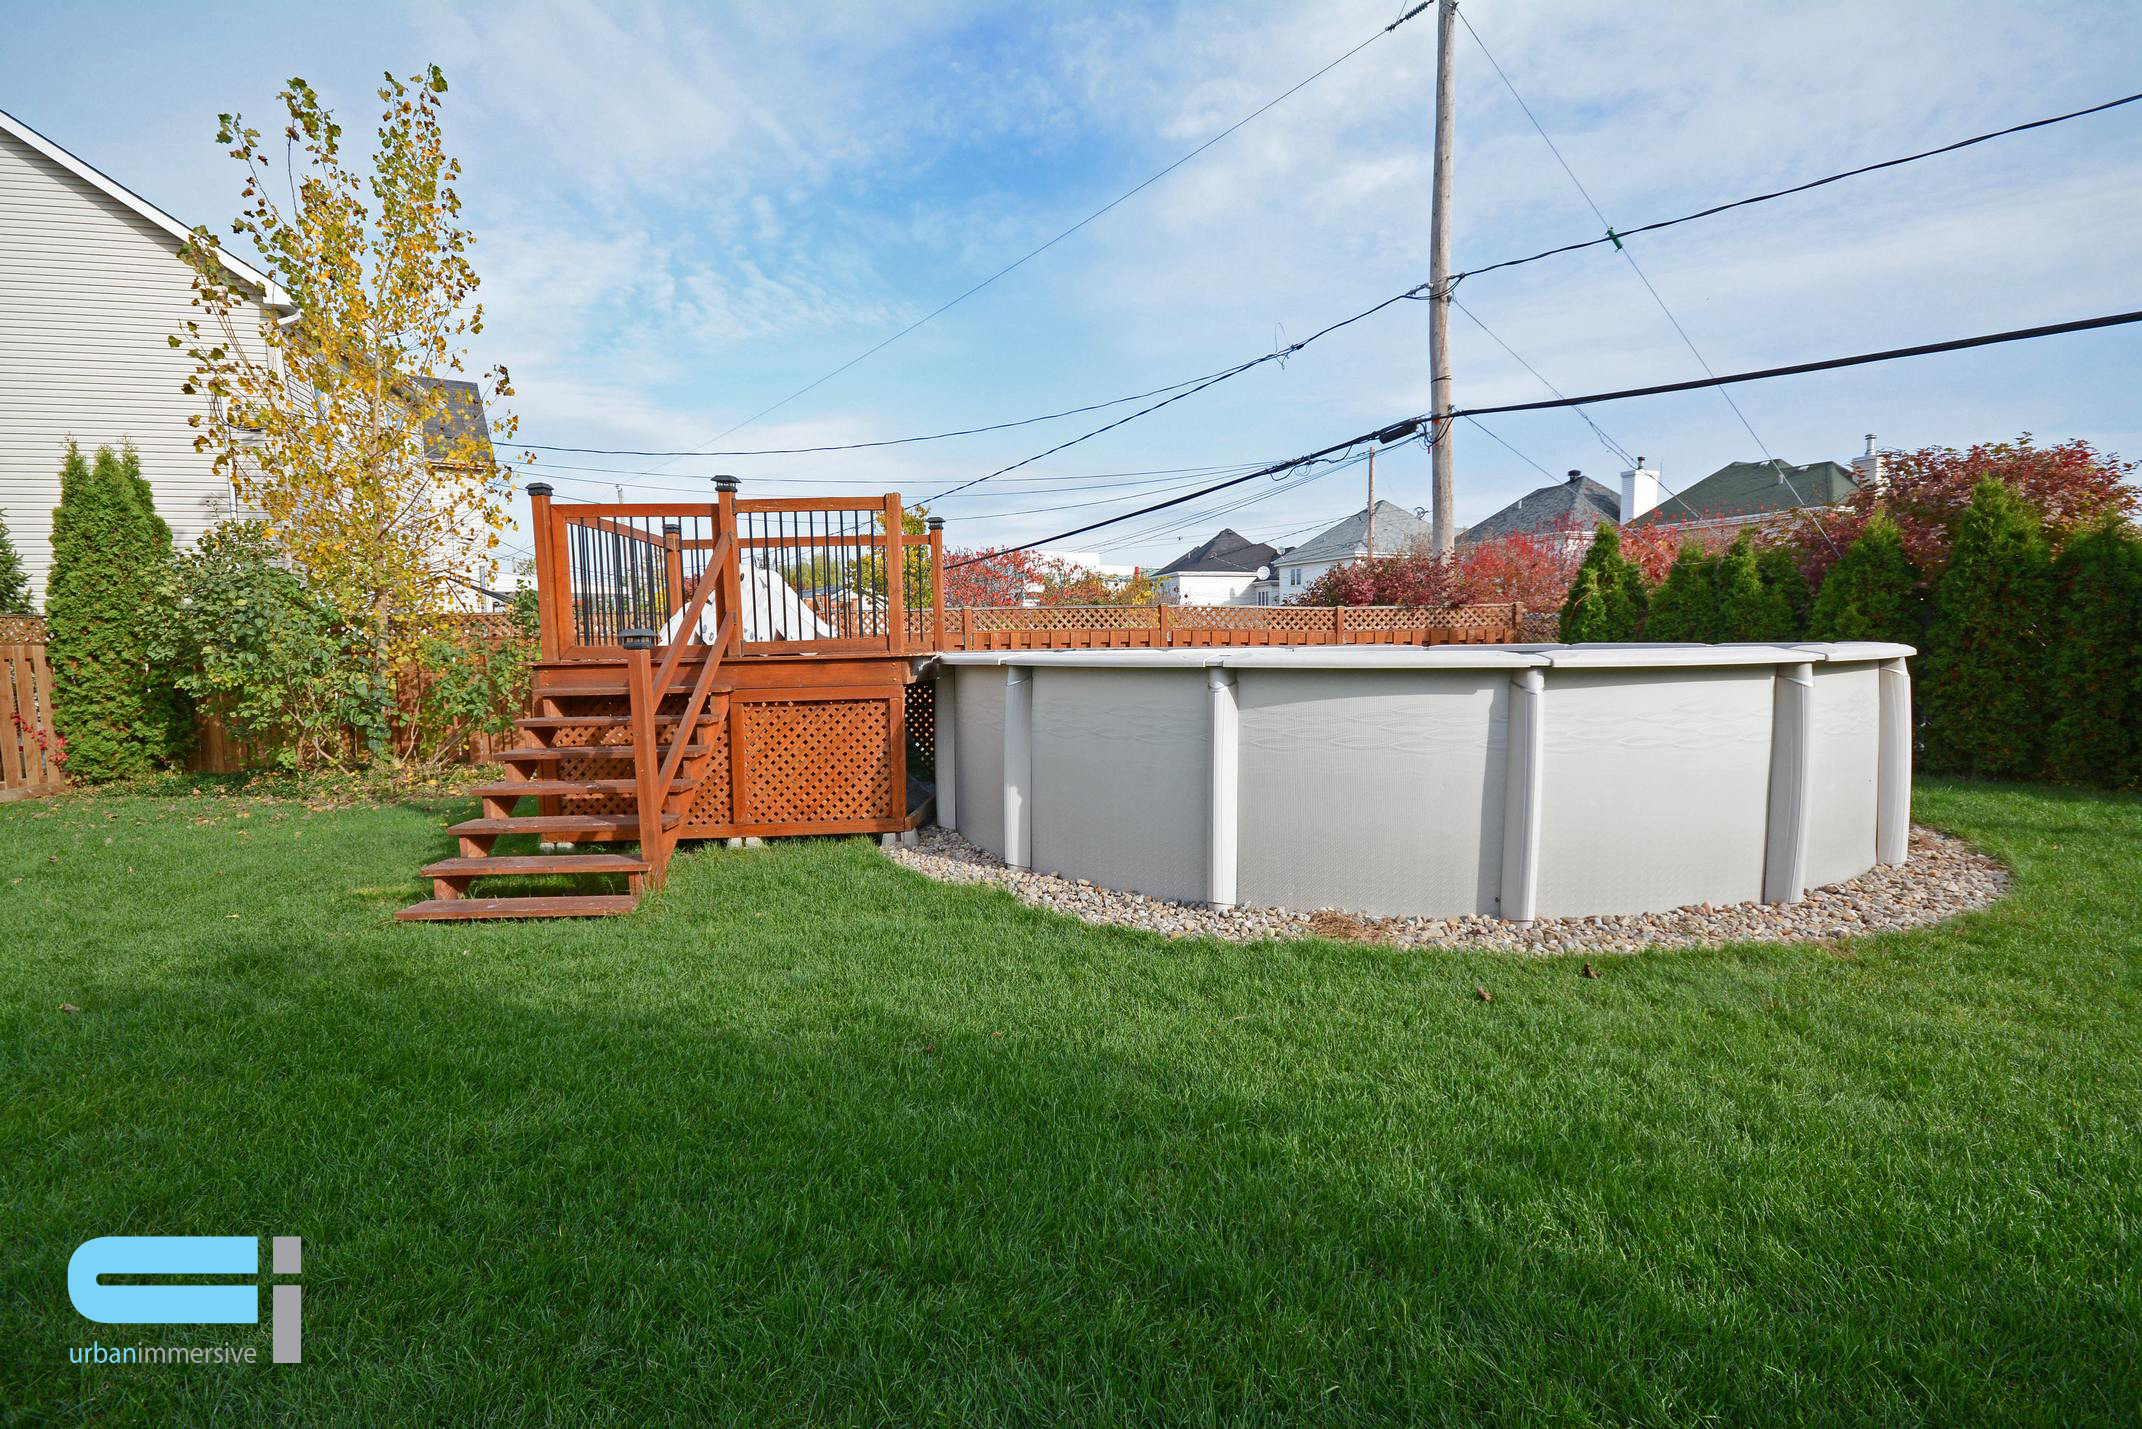 Piscine hors terre avec patio en bois